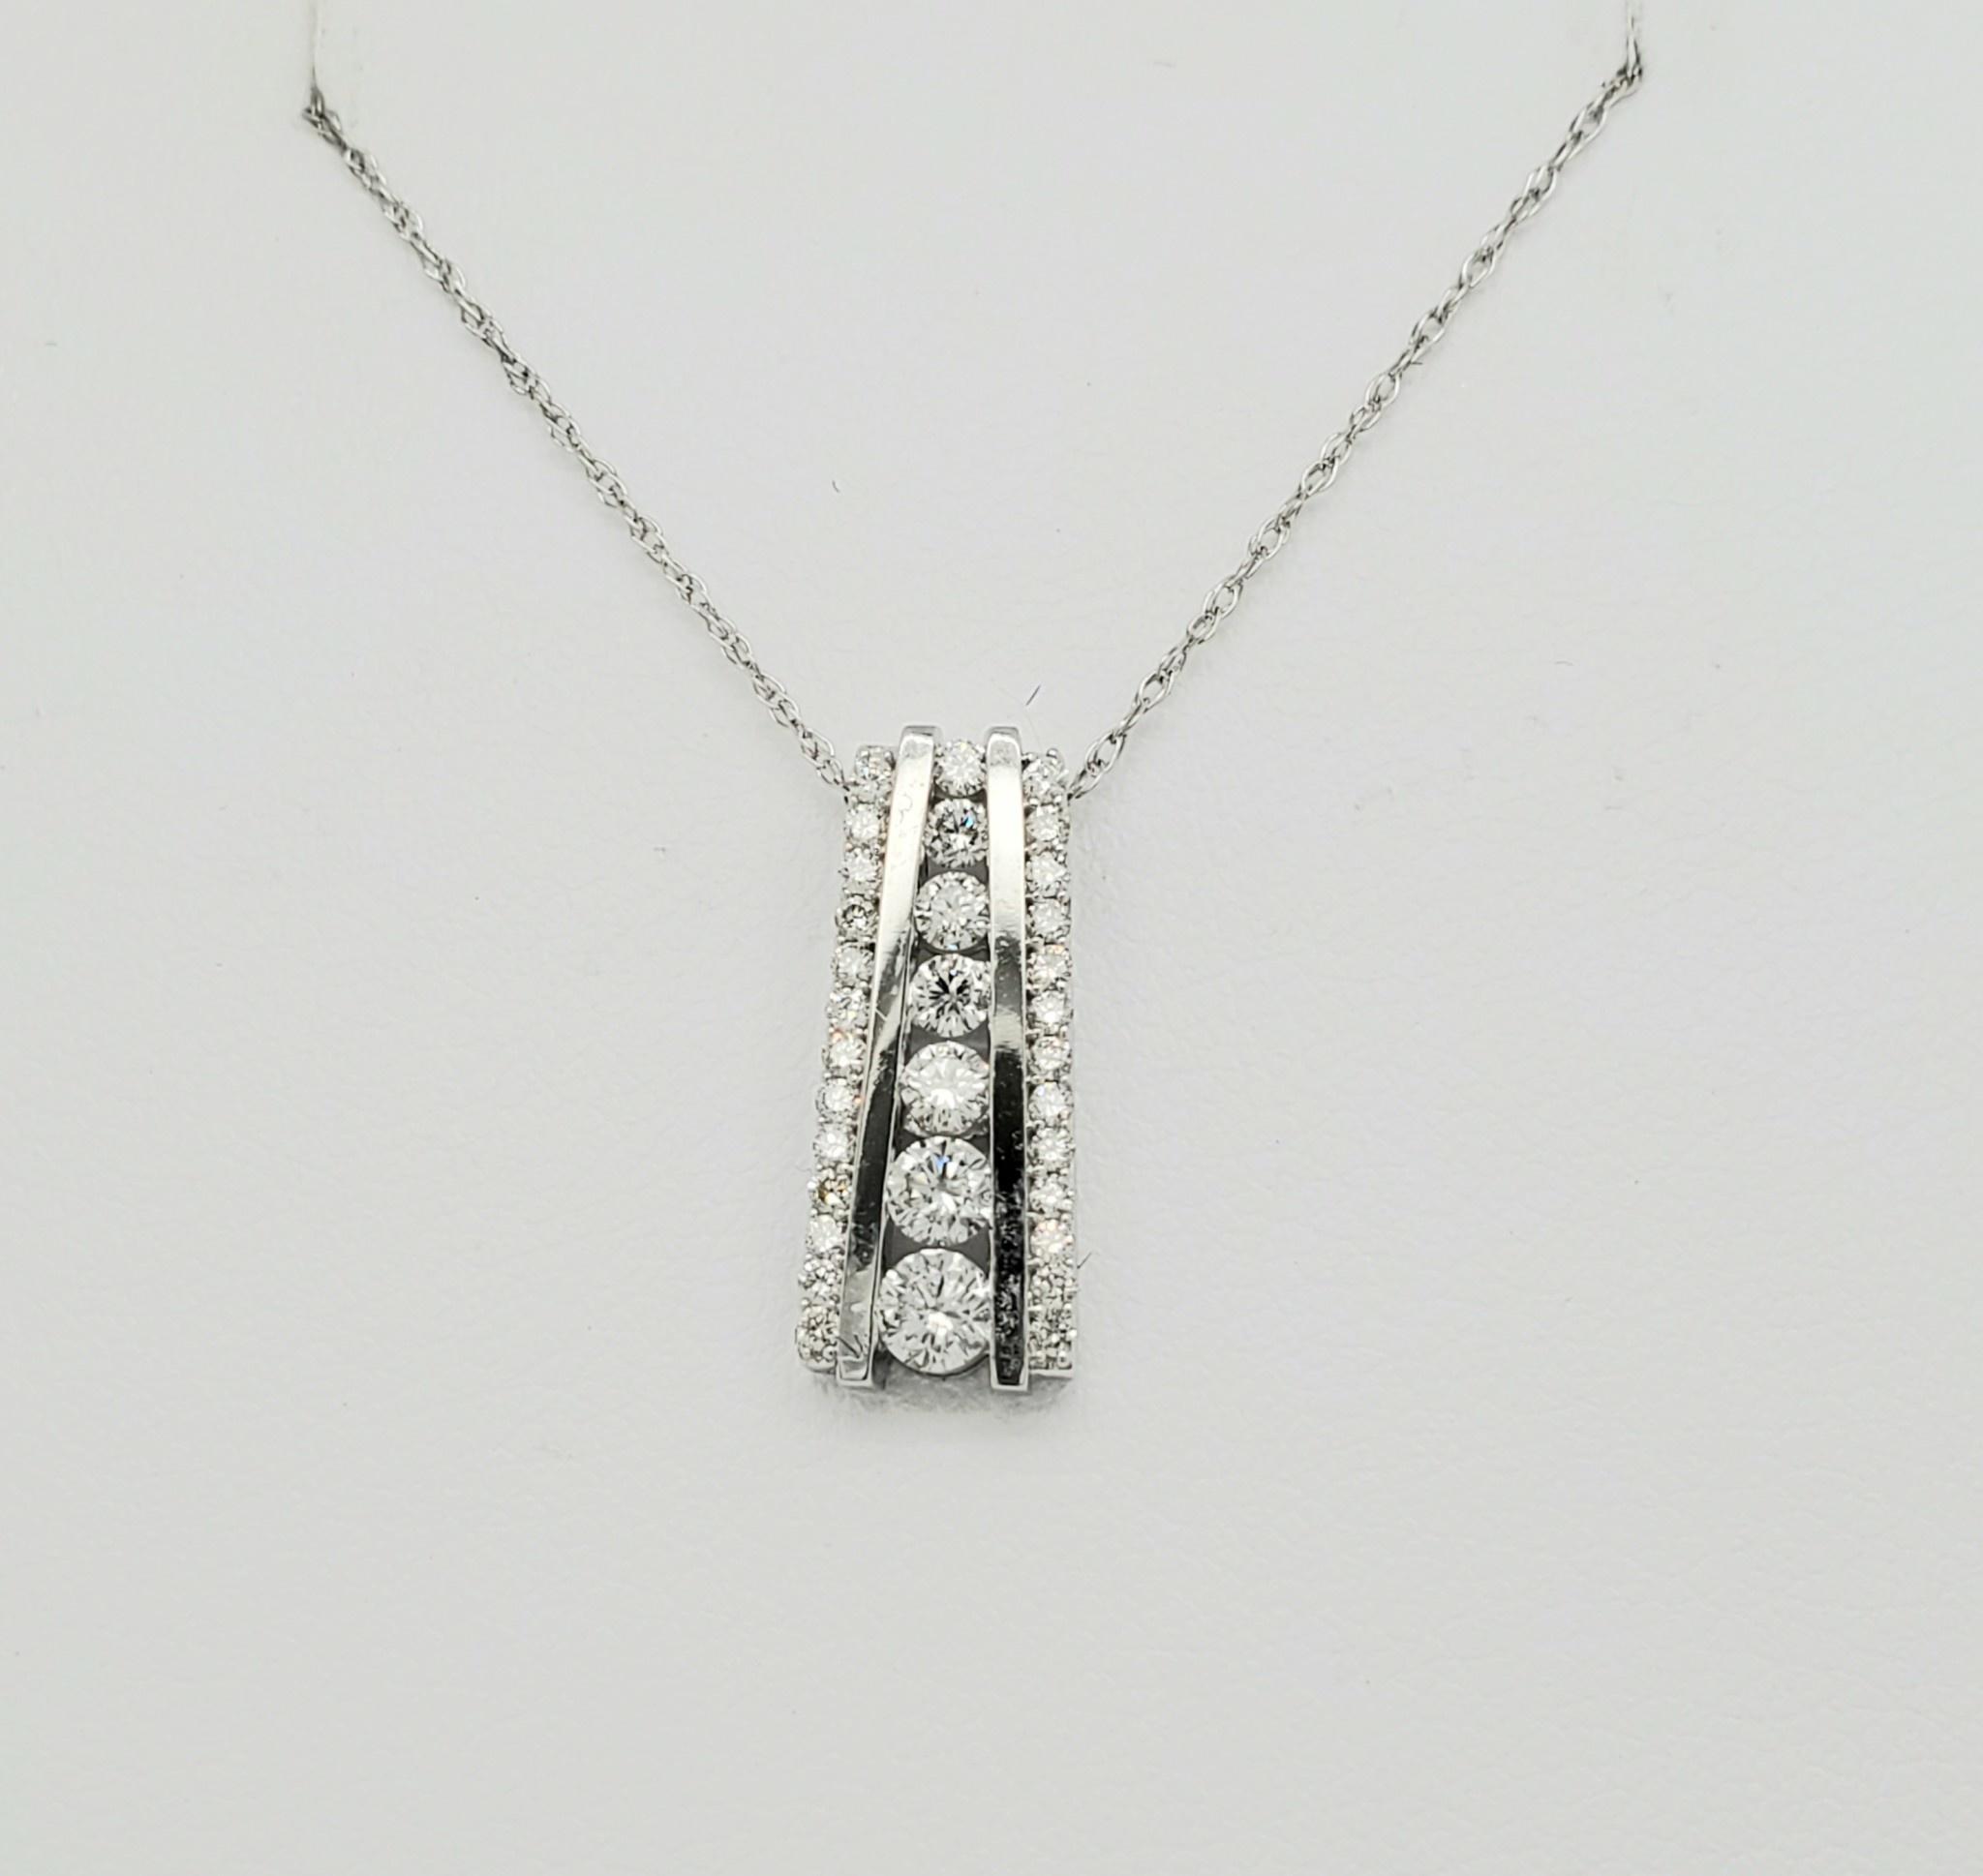 14KT WG Diamond Pendant 0.50 CTTW